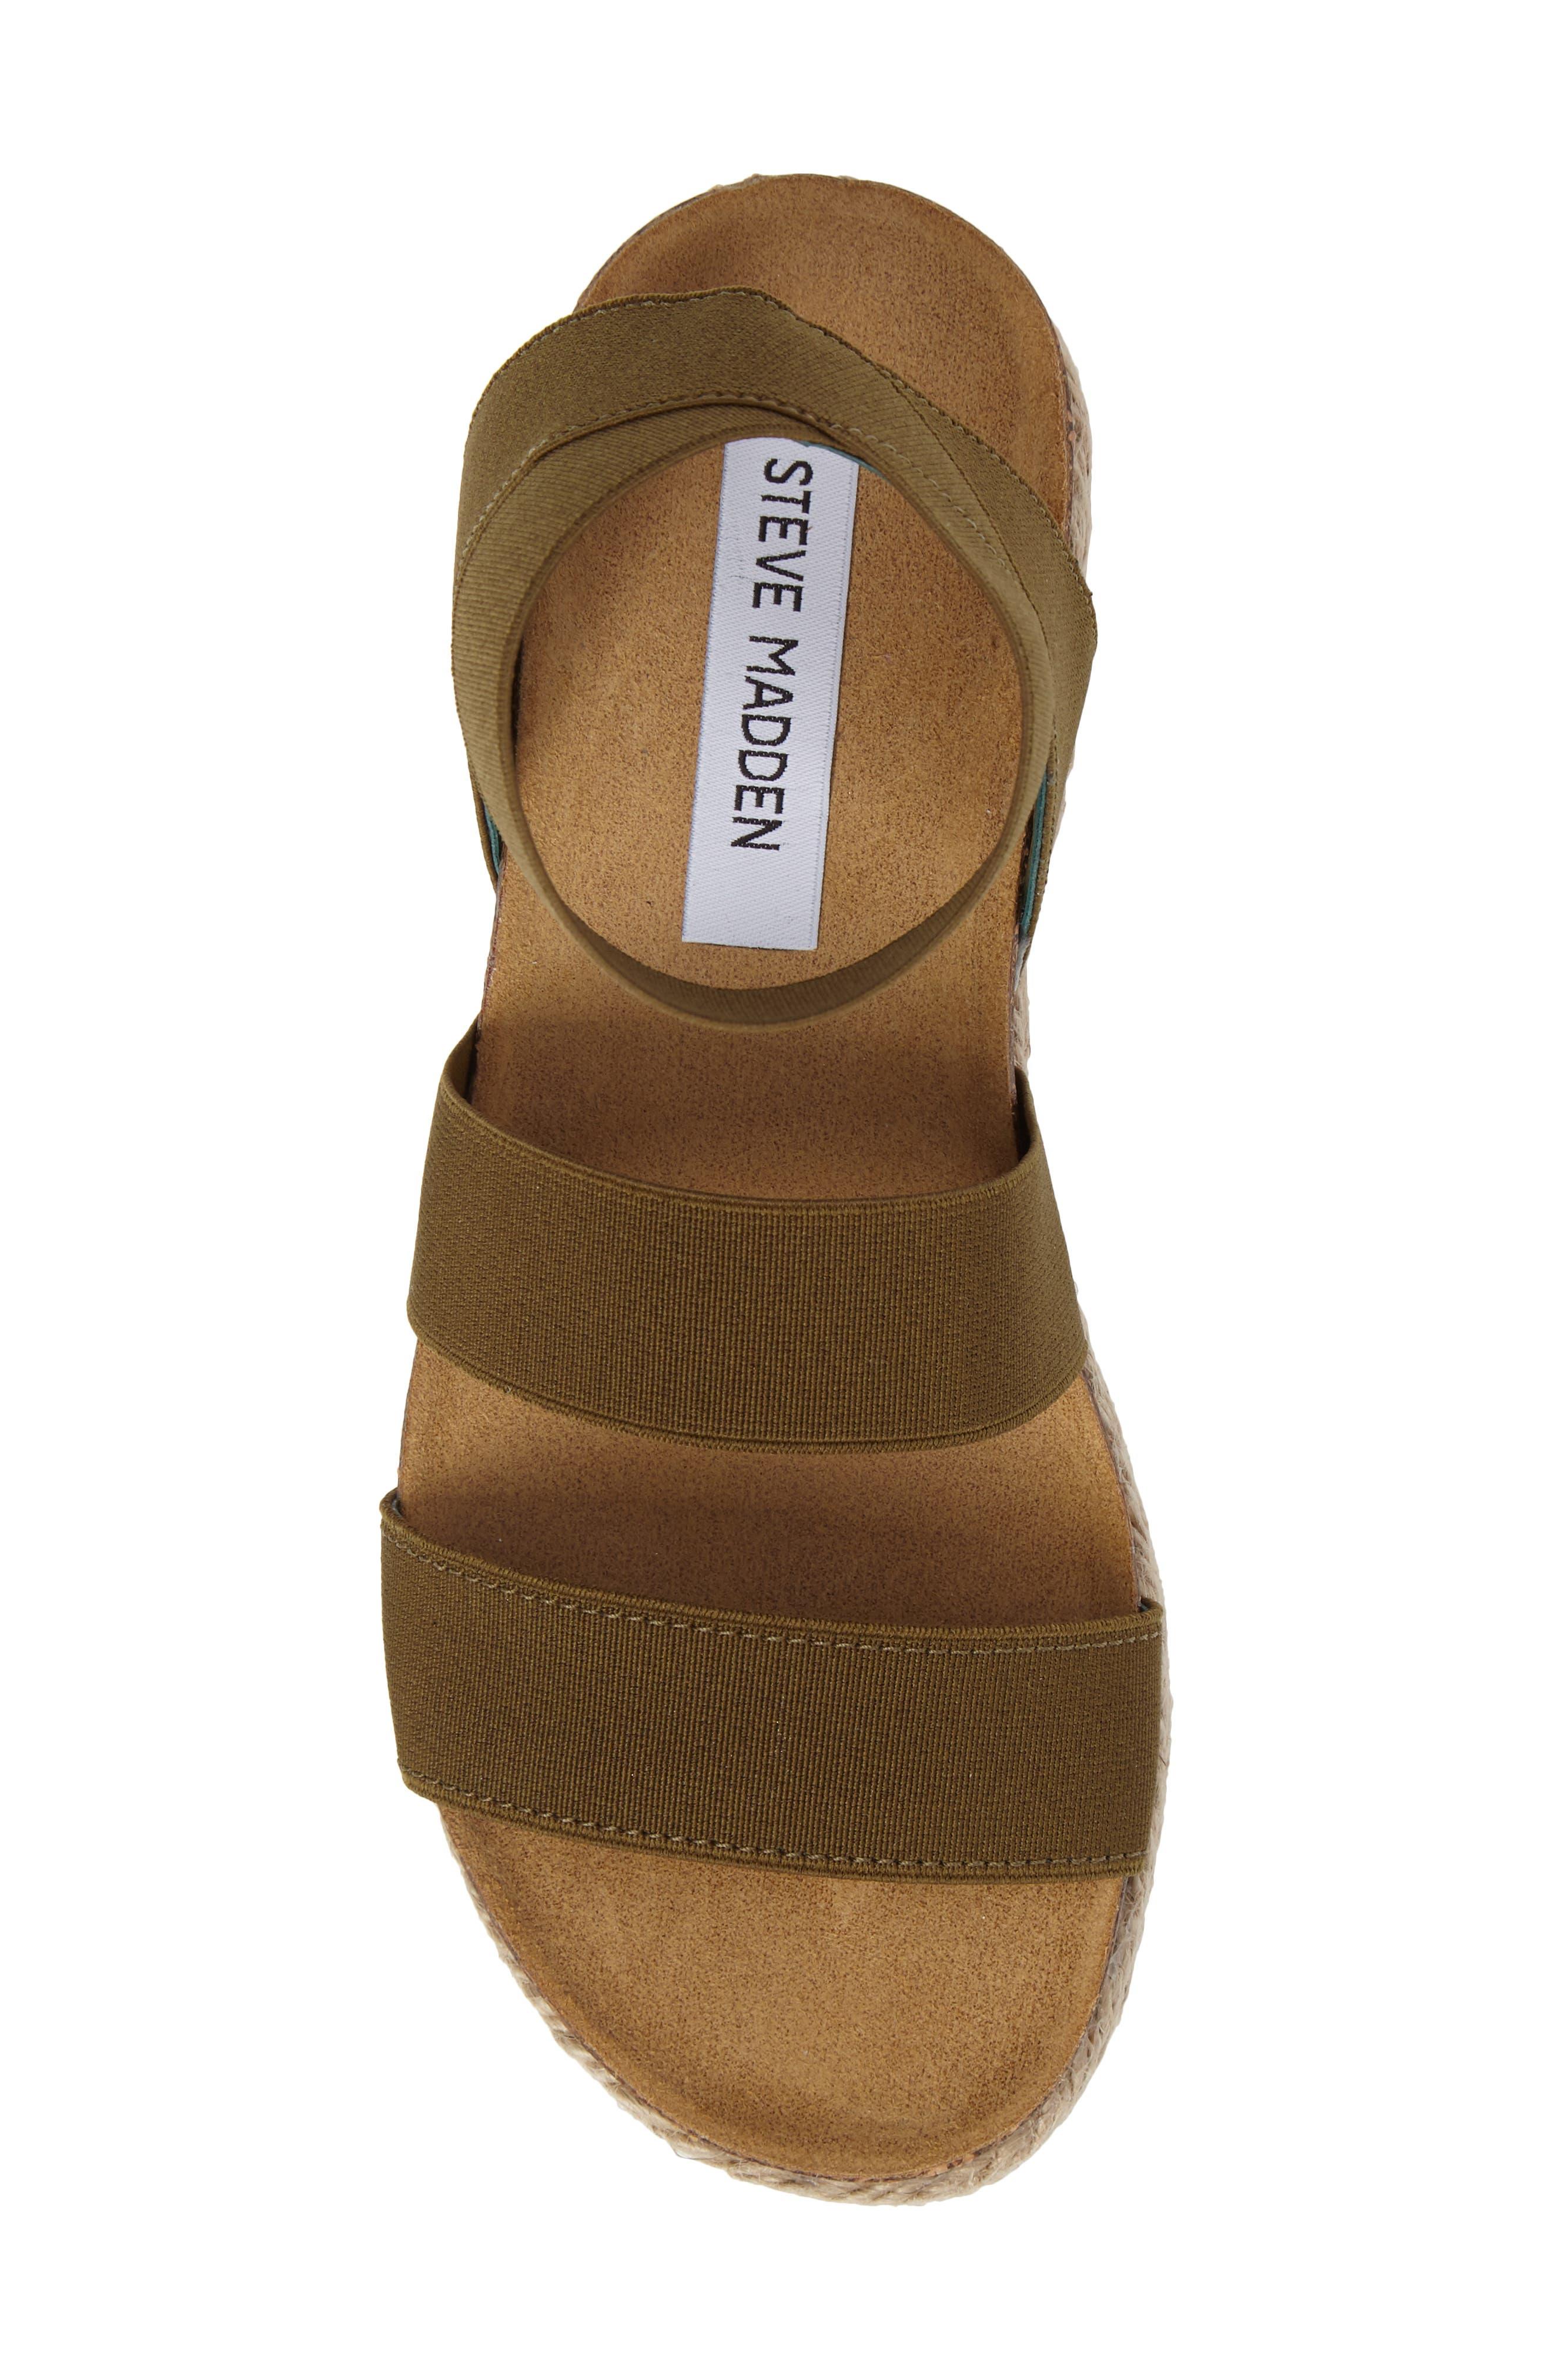 Kimmie Flatform Sandal,                             Alternate thumbnail 15, color,